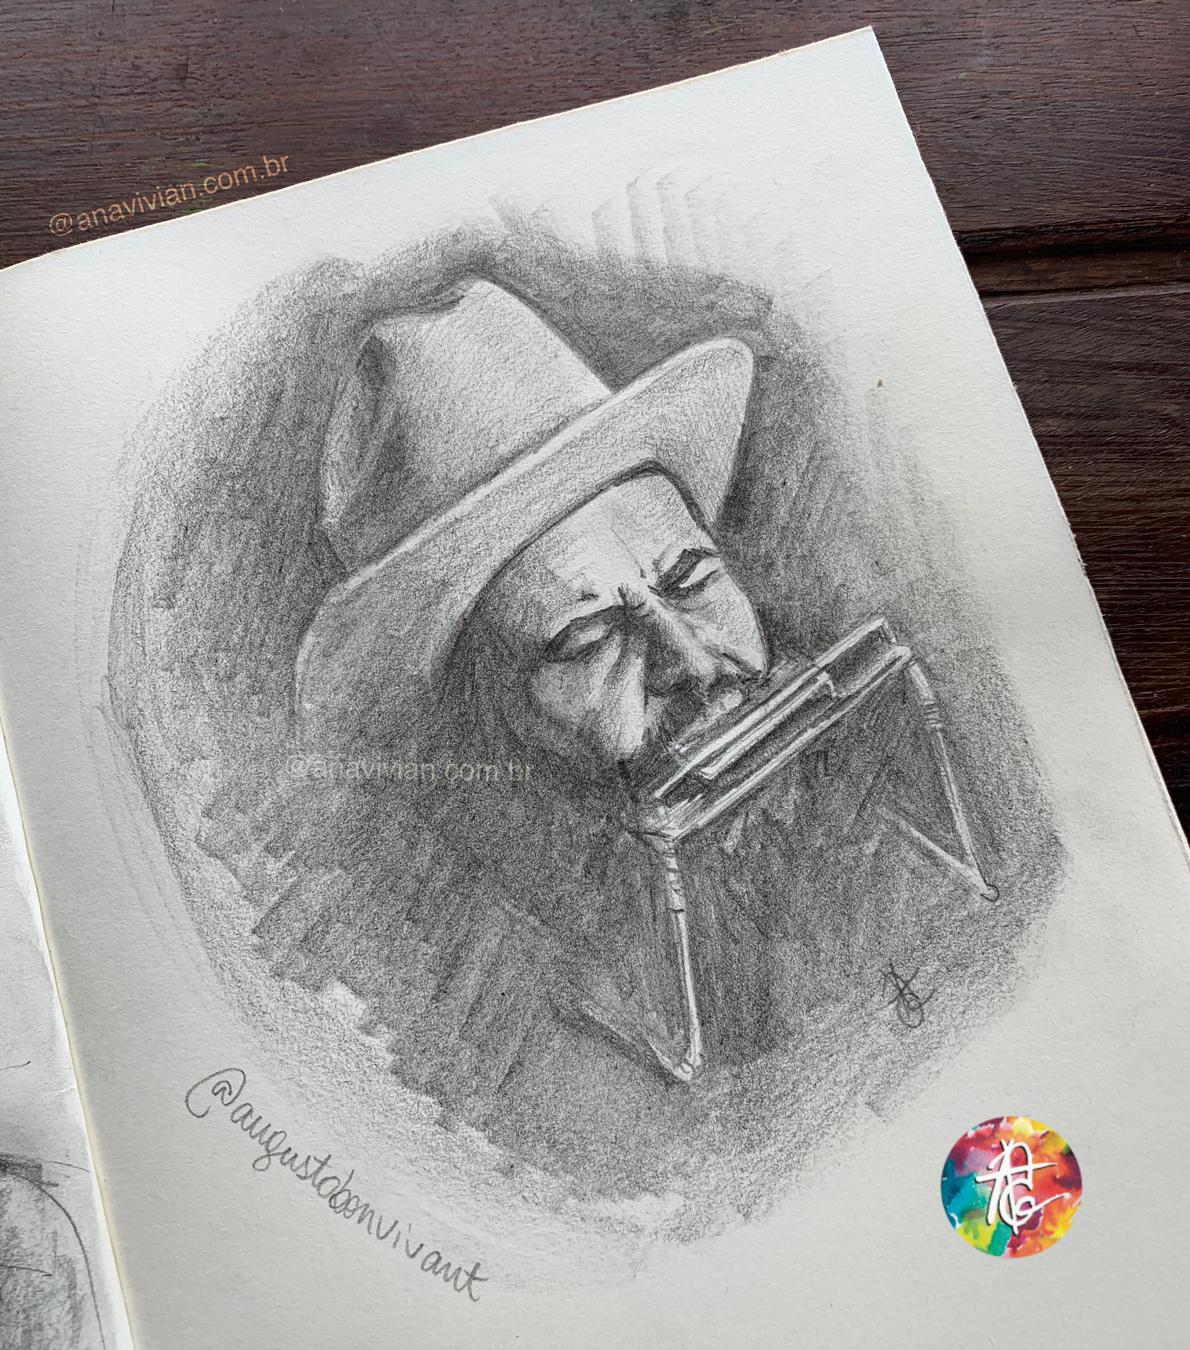 Sketchbook: Retrato do Augusto Bonvivant